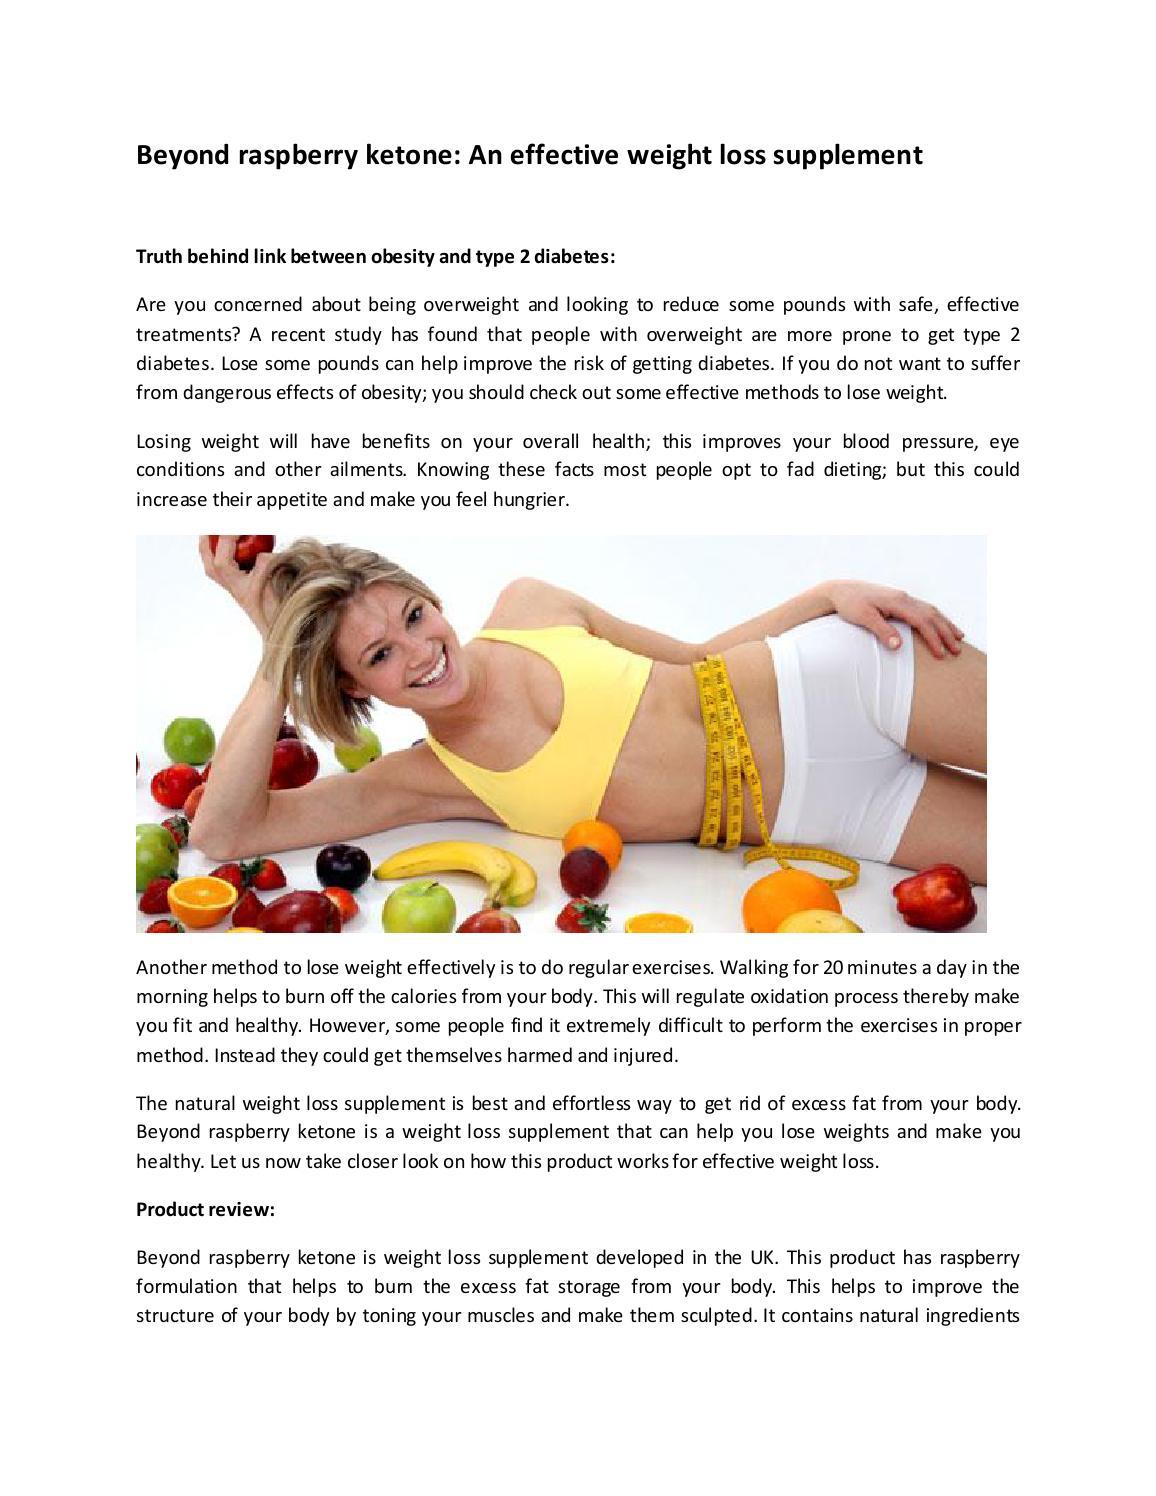 Juice detox fat loss photo 1